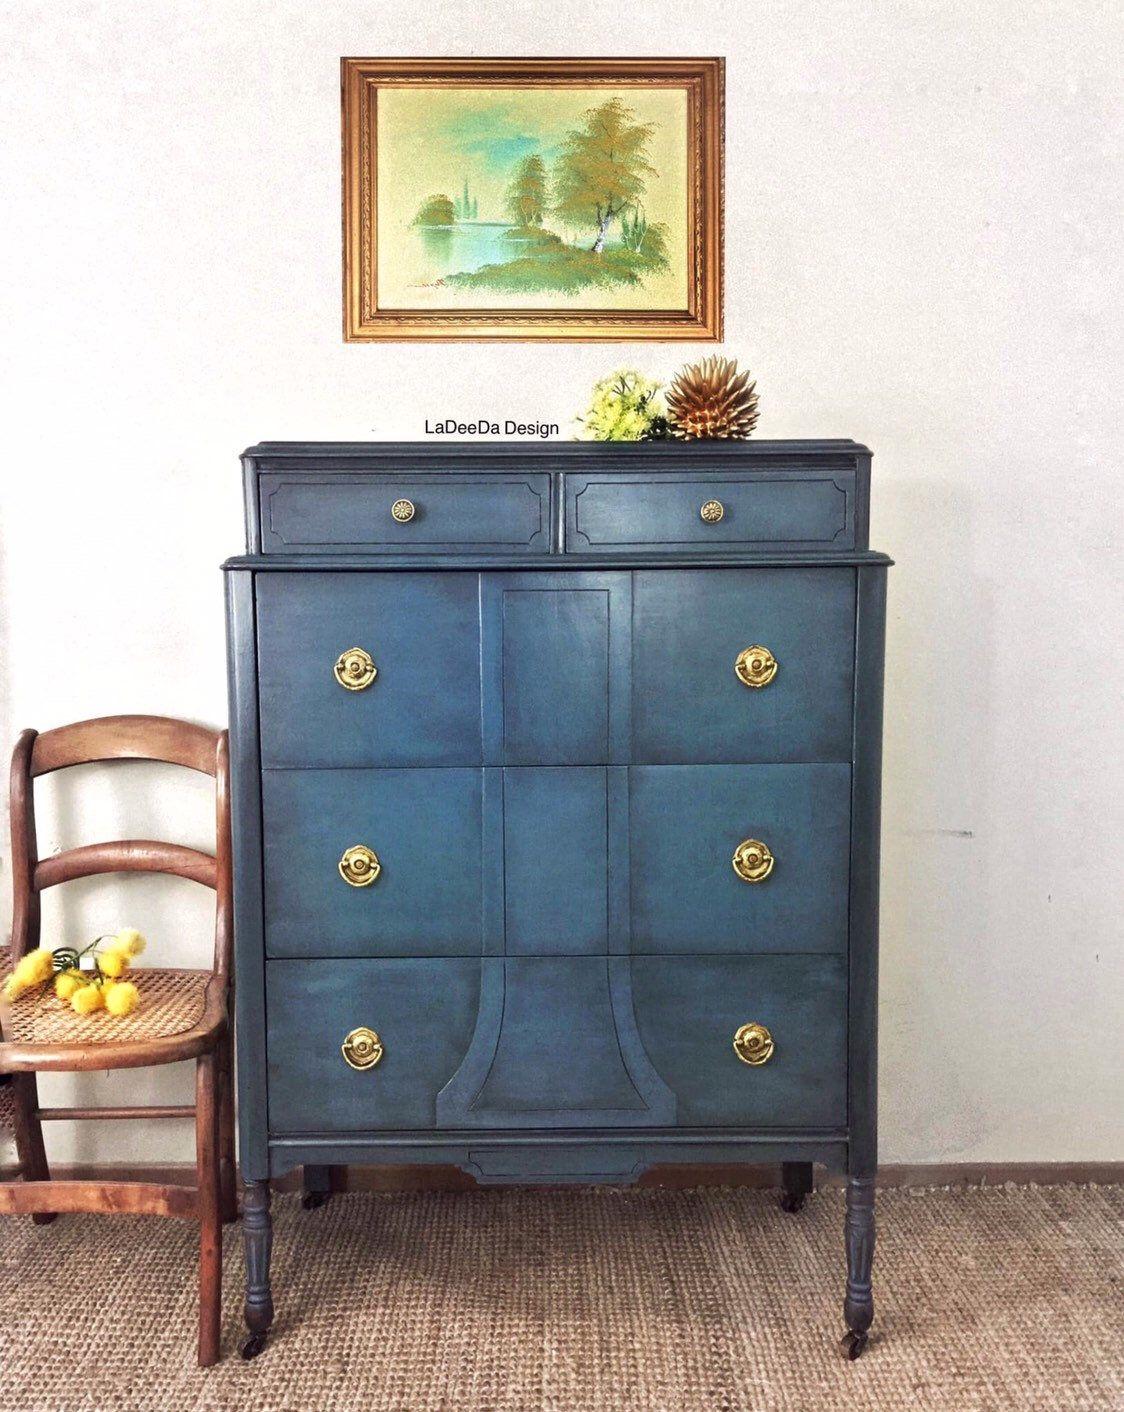 New To My My Etsy Shop Vintage Teal Blue Wood Dresser Antique Tall Boy Dresser 5 Drawer Painted Dresser Ches Painted Dresser Upcycle Dresser Wood Dresser [ 1412 x 1124 Pixel ]